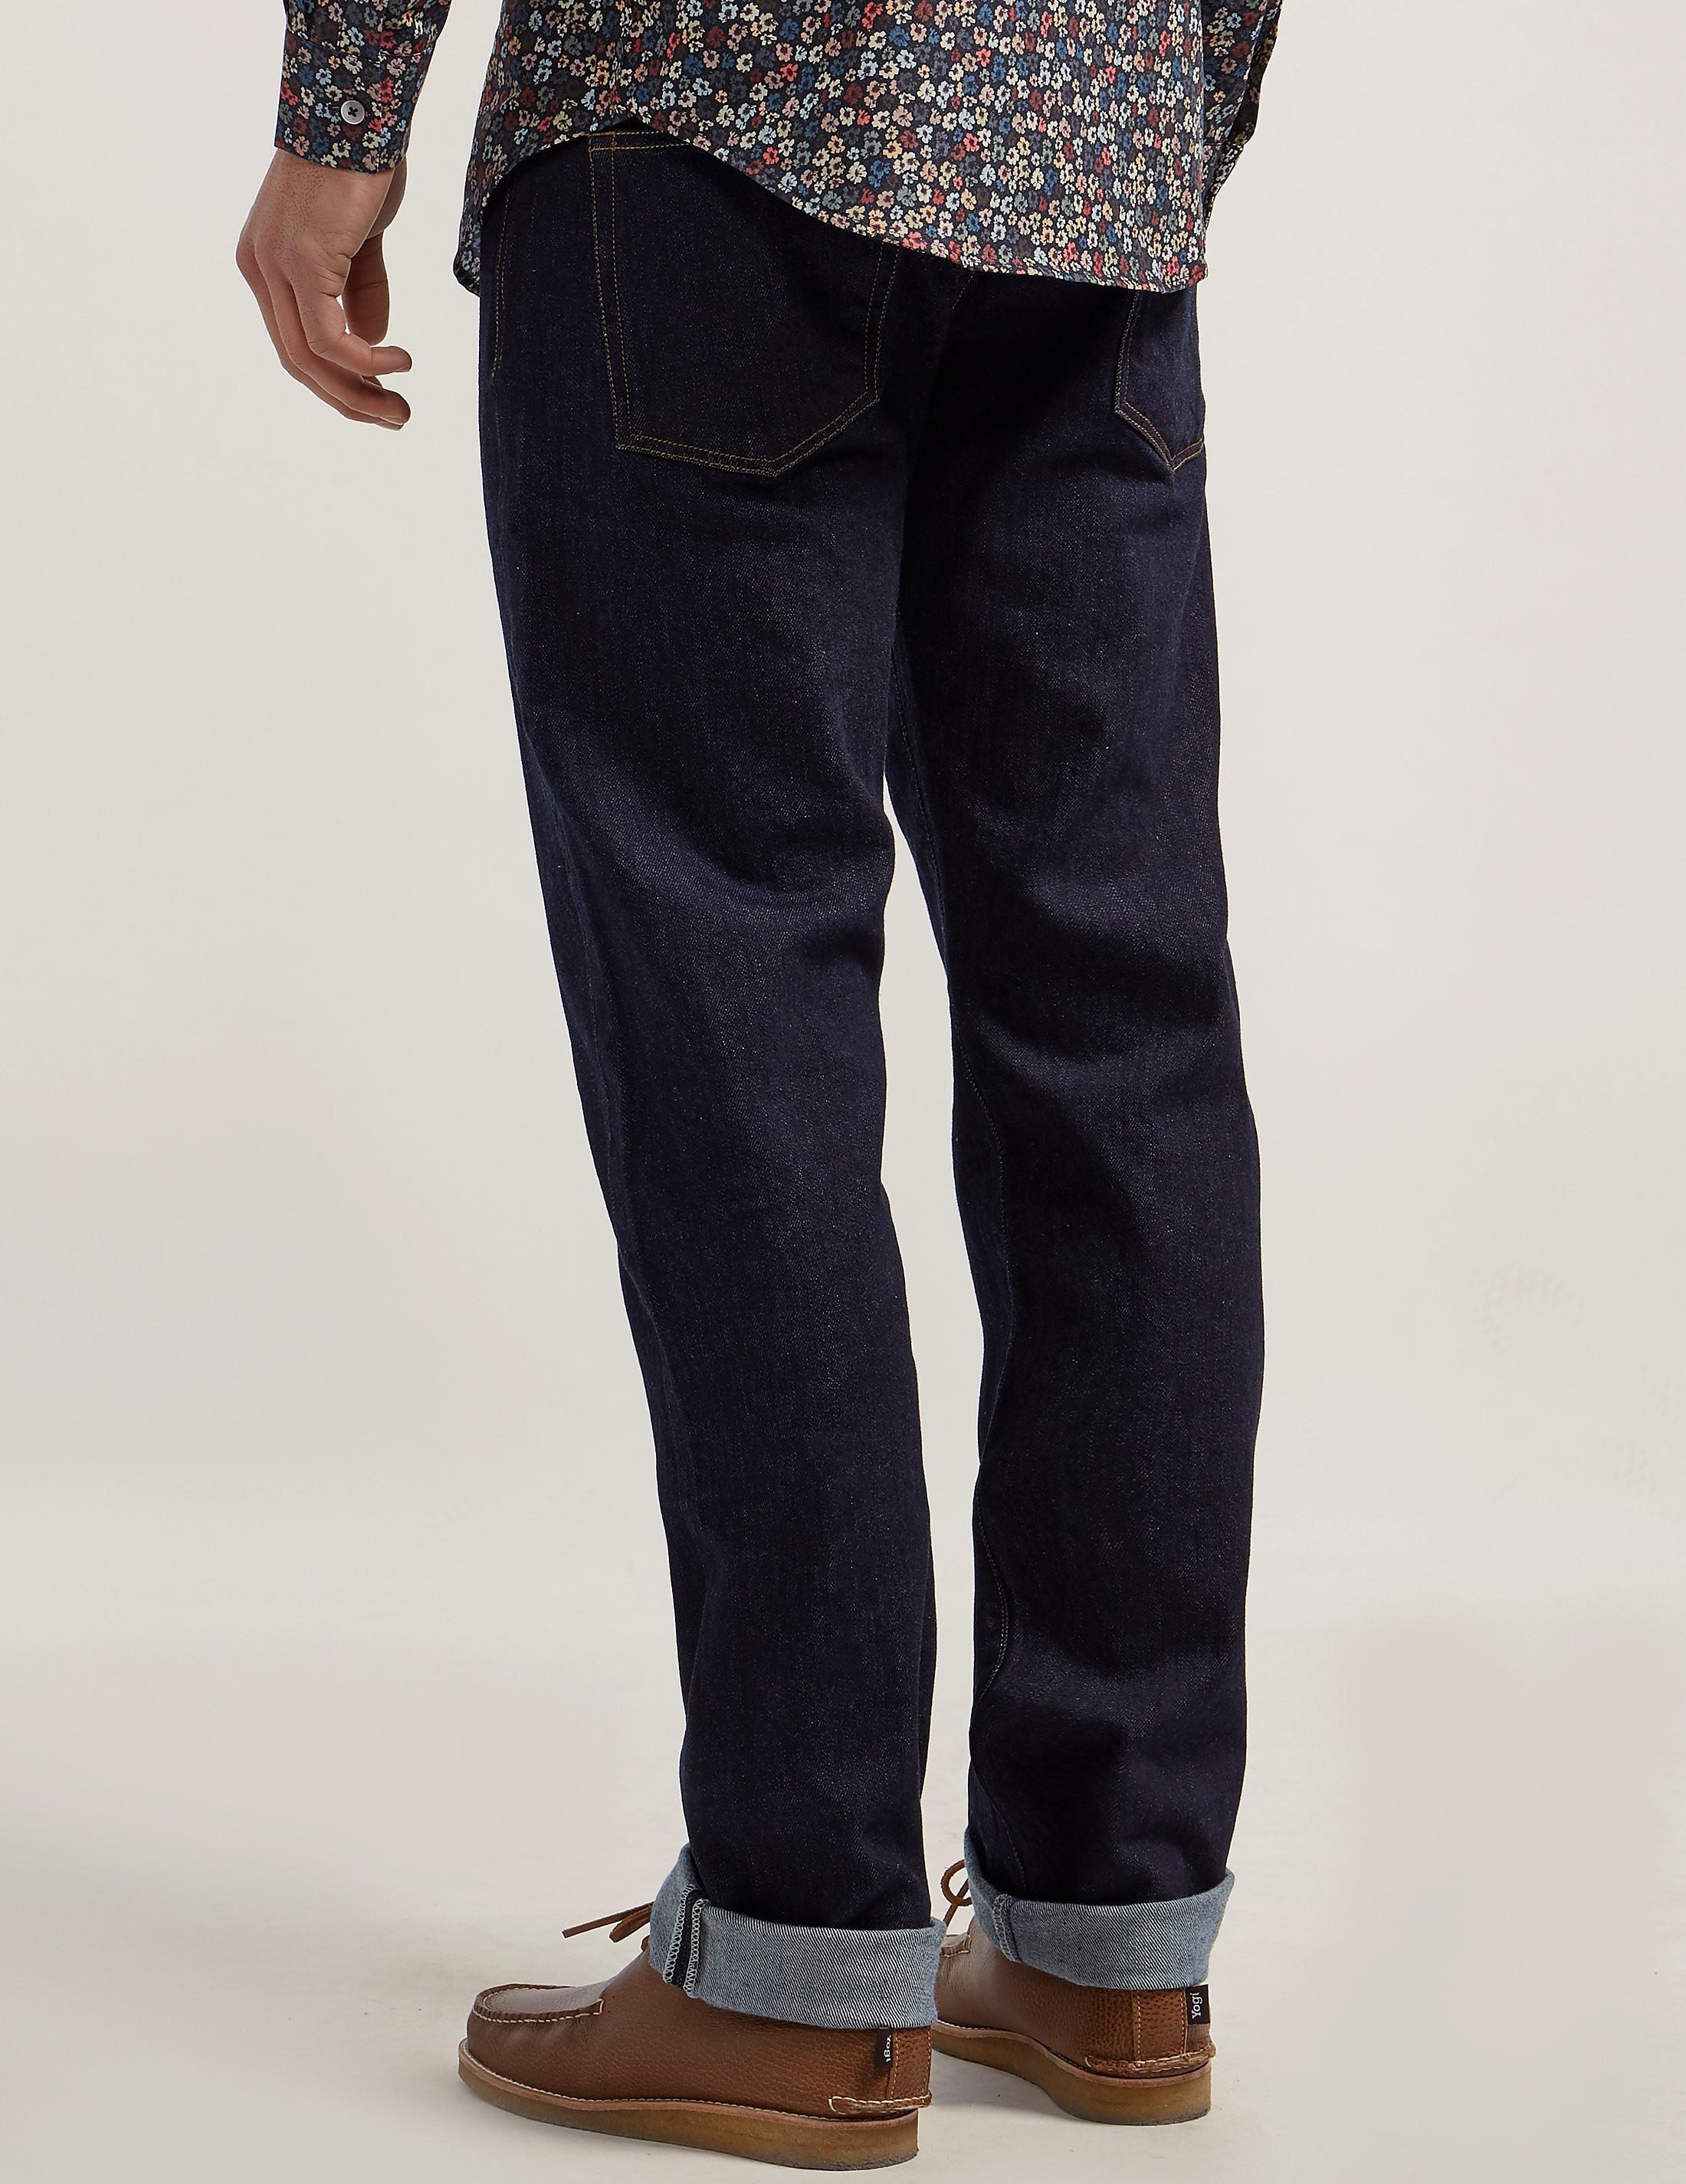 Paul Smith Standard Fit Denim Jean